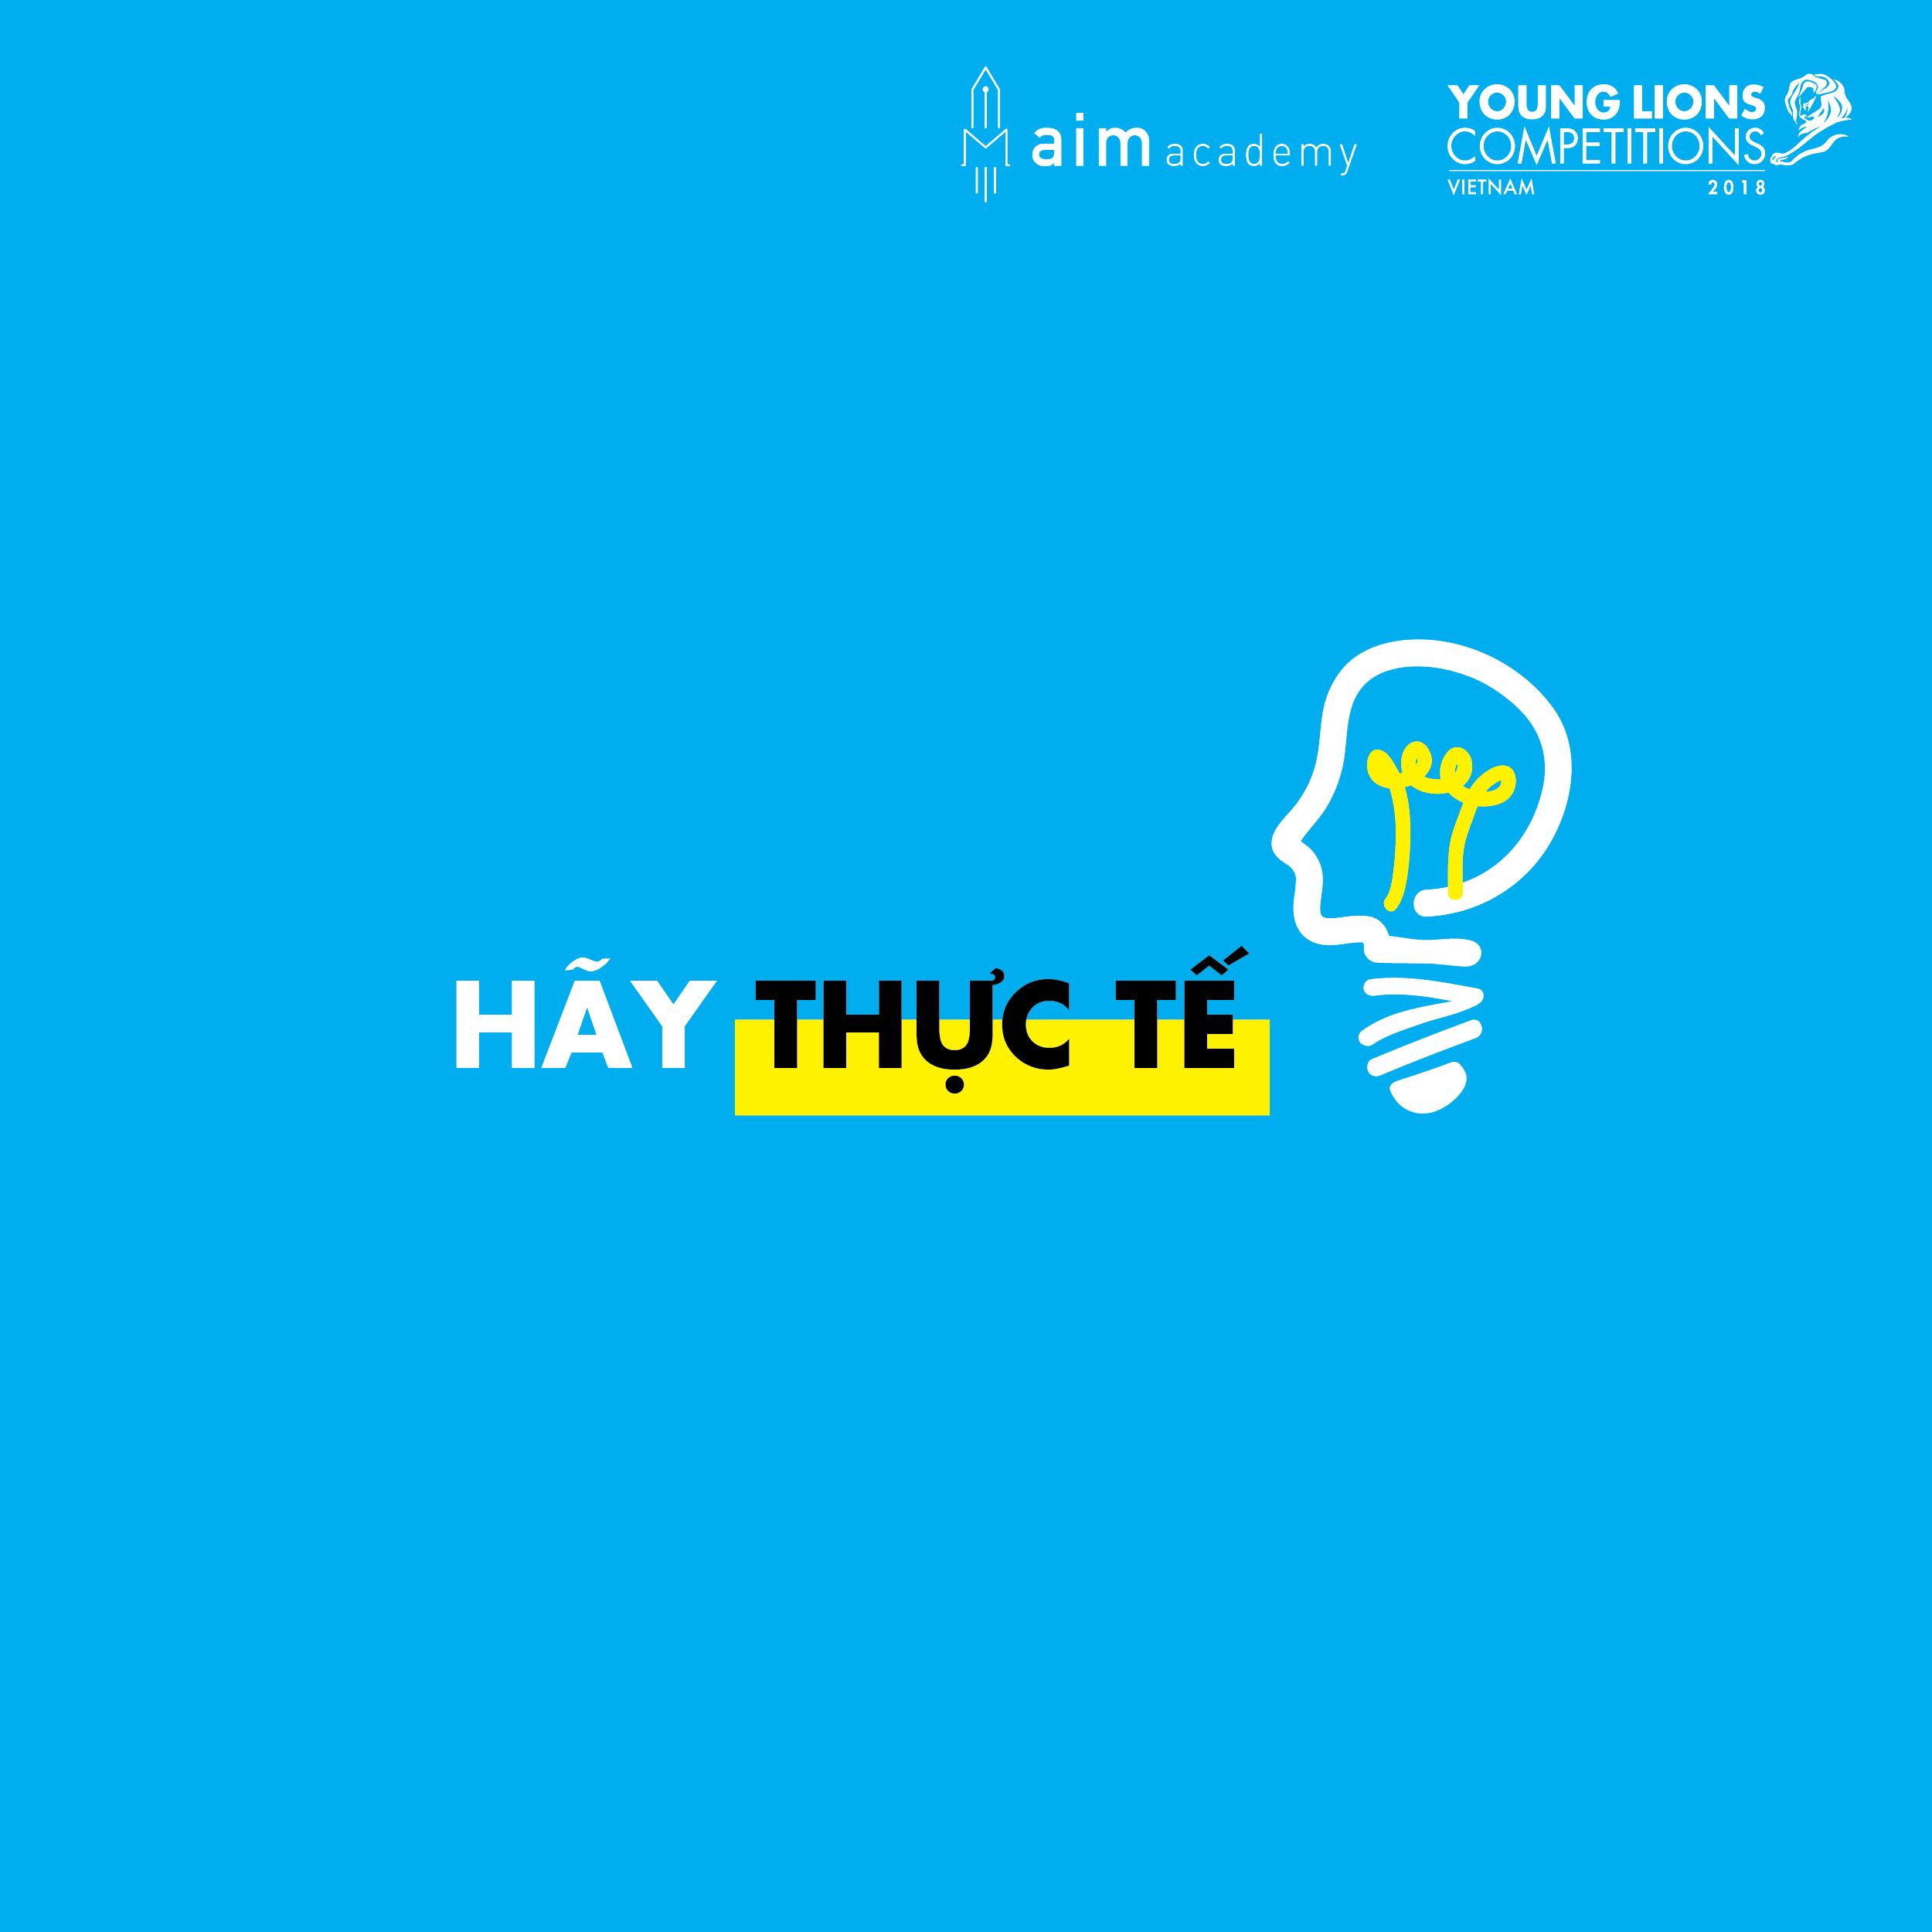 rgb_creative_ideas_vietnam_young_lions_2018_c6_4_4-01